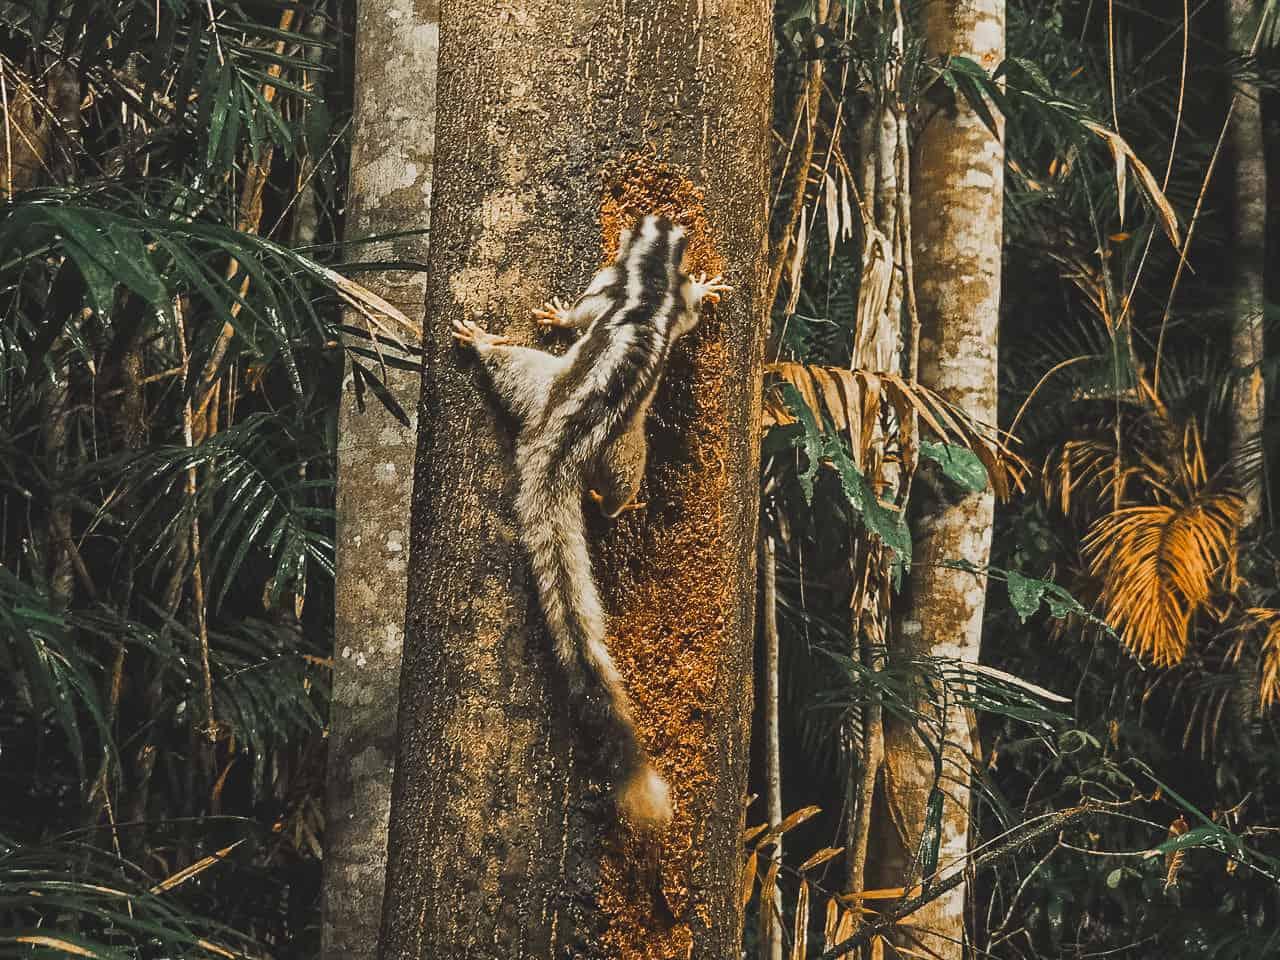 striped-possum-Chambers-Wildlife-Lodge-Atherton-Tablelands-North-Queensland-Australia ] Travel Mermaid 017